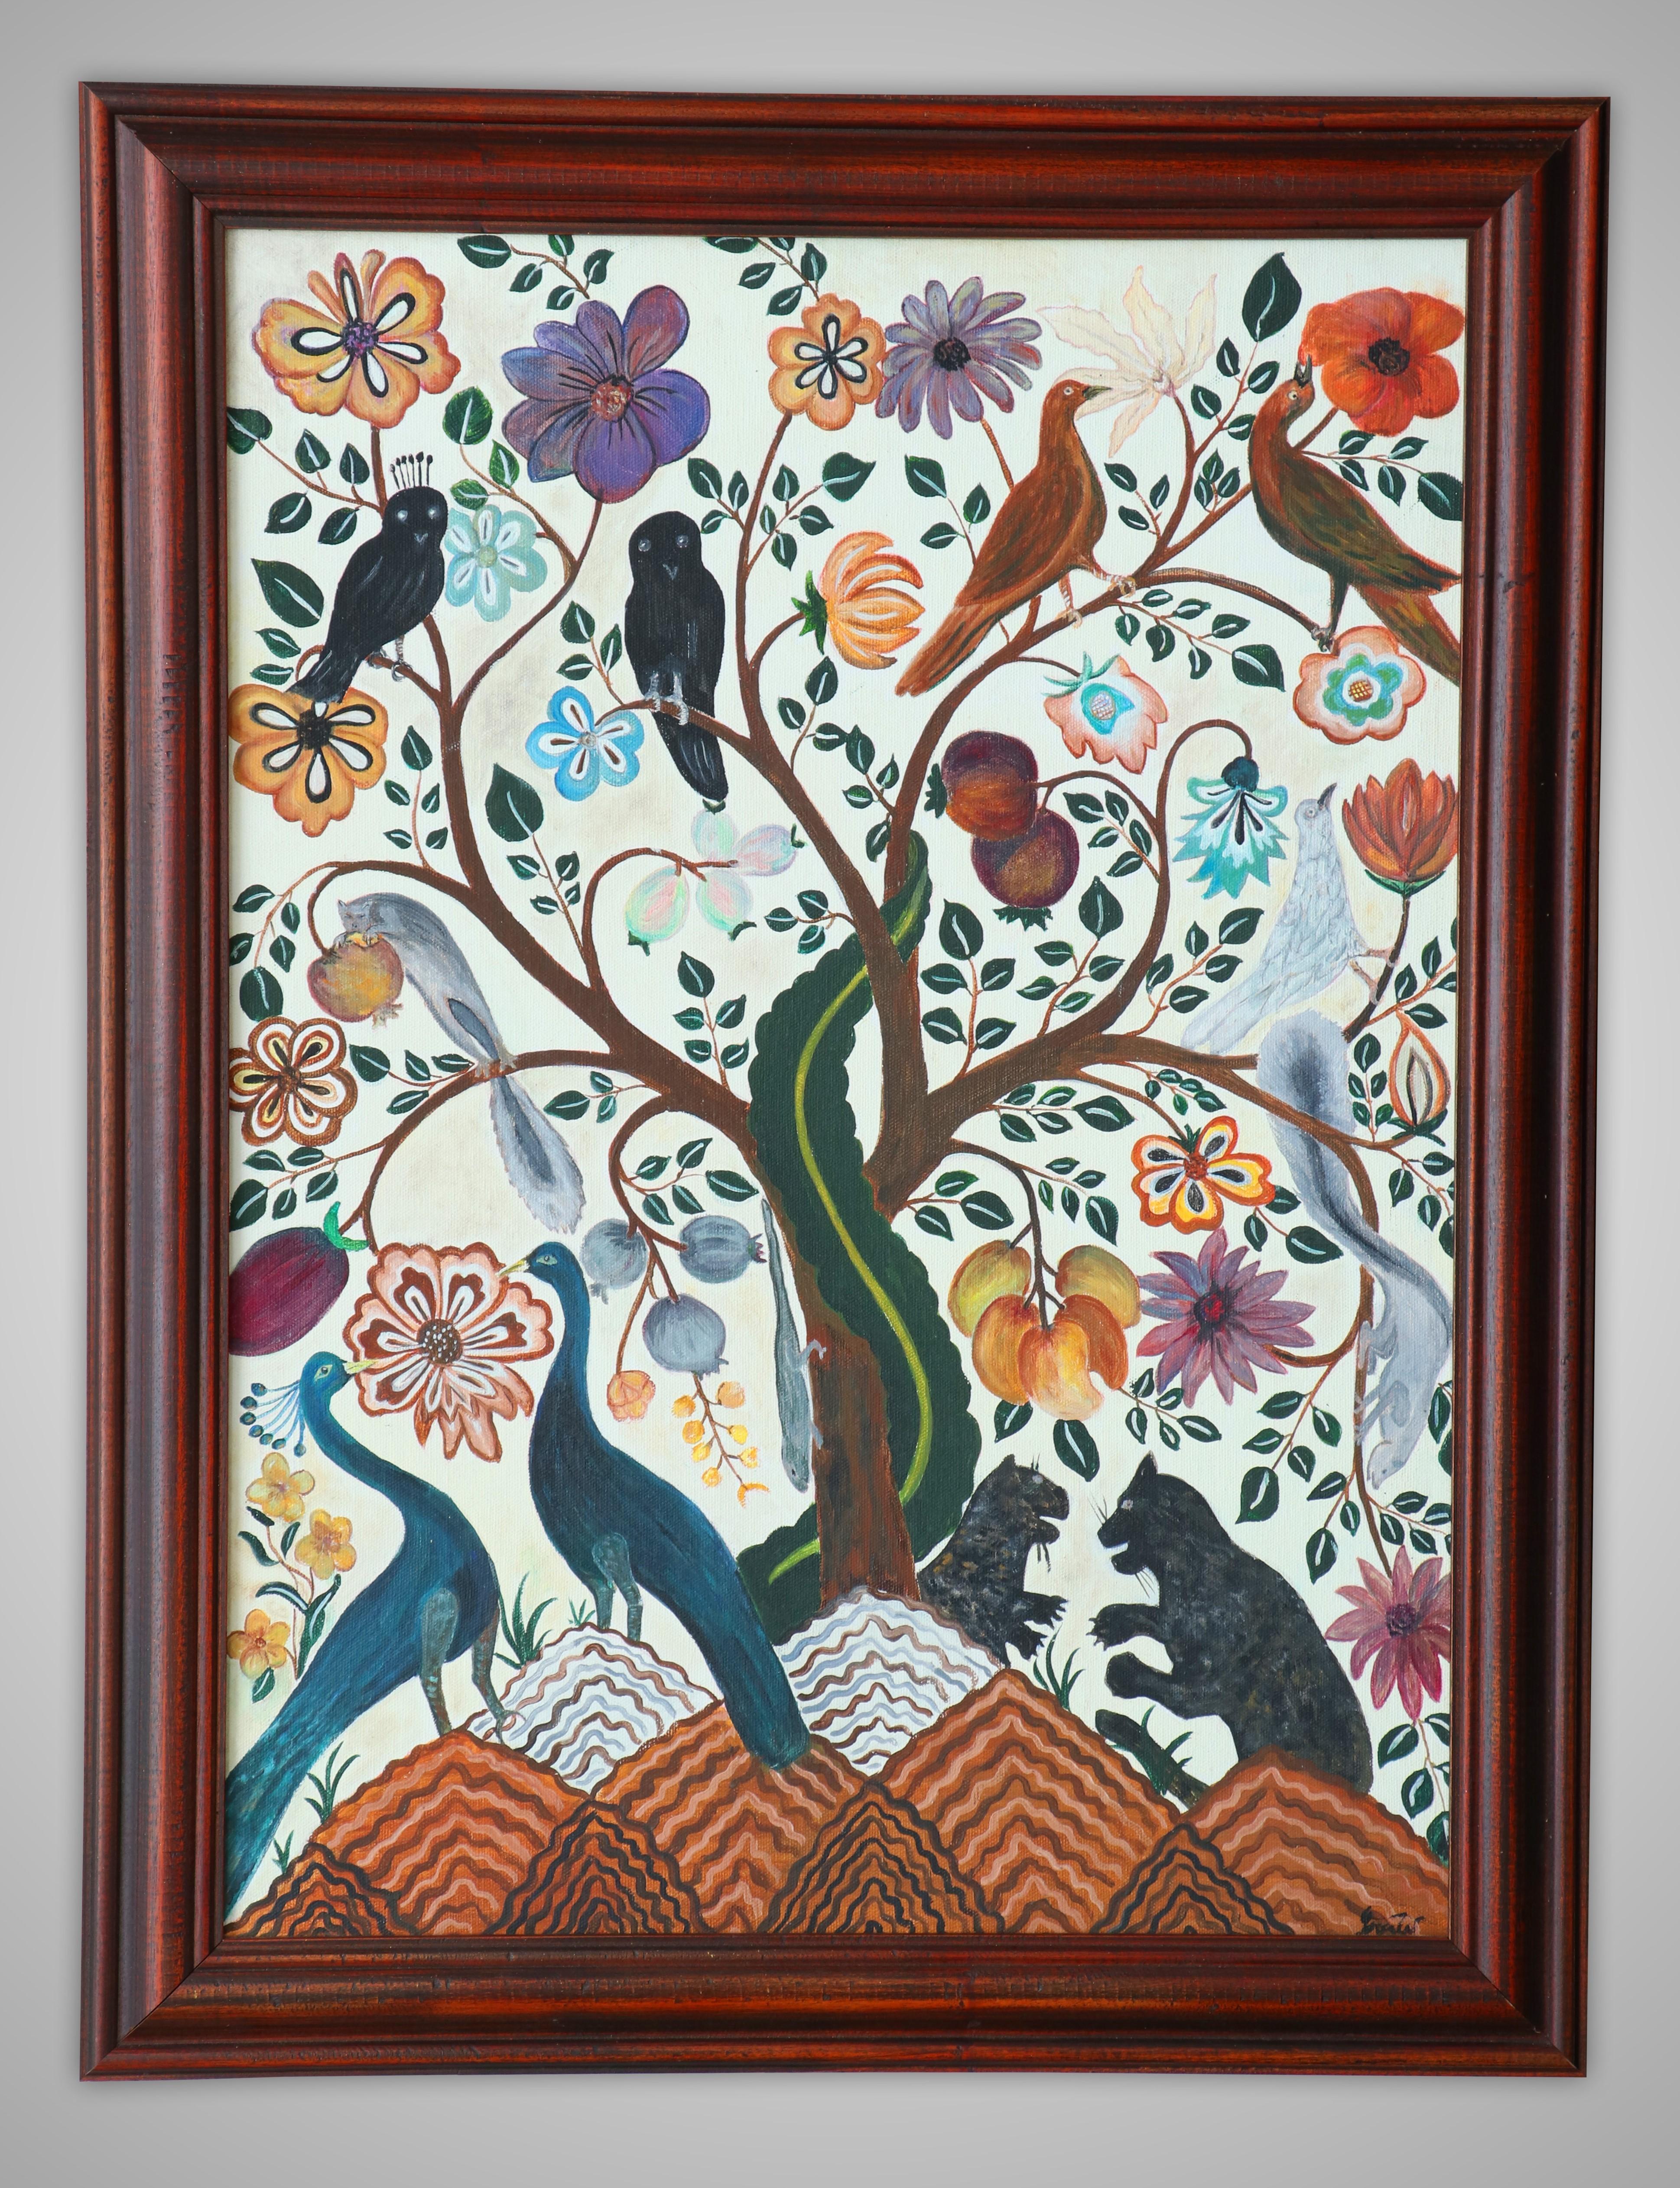 Tree of Life by Iranganie Wickramasinghe